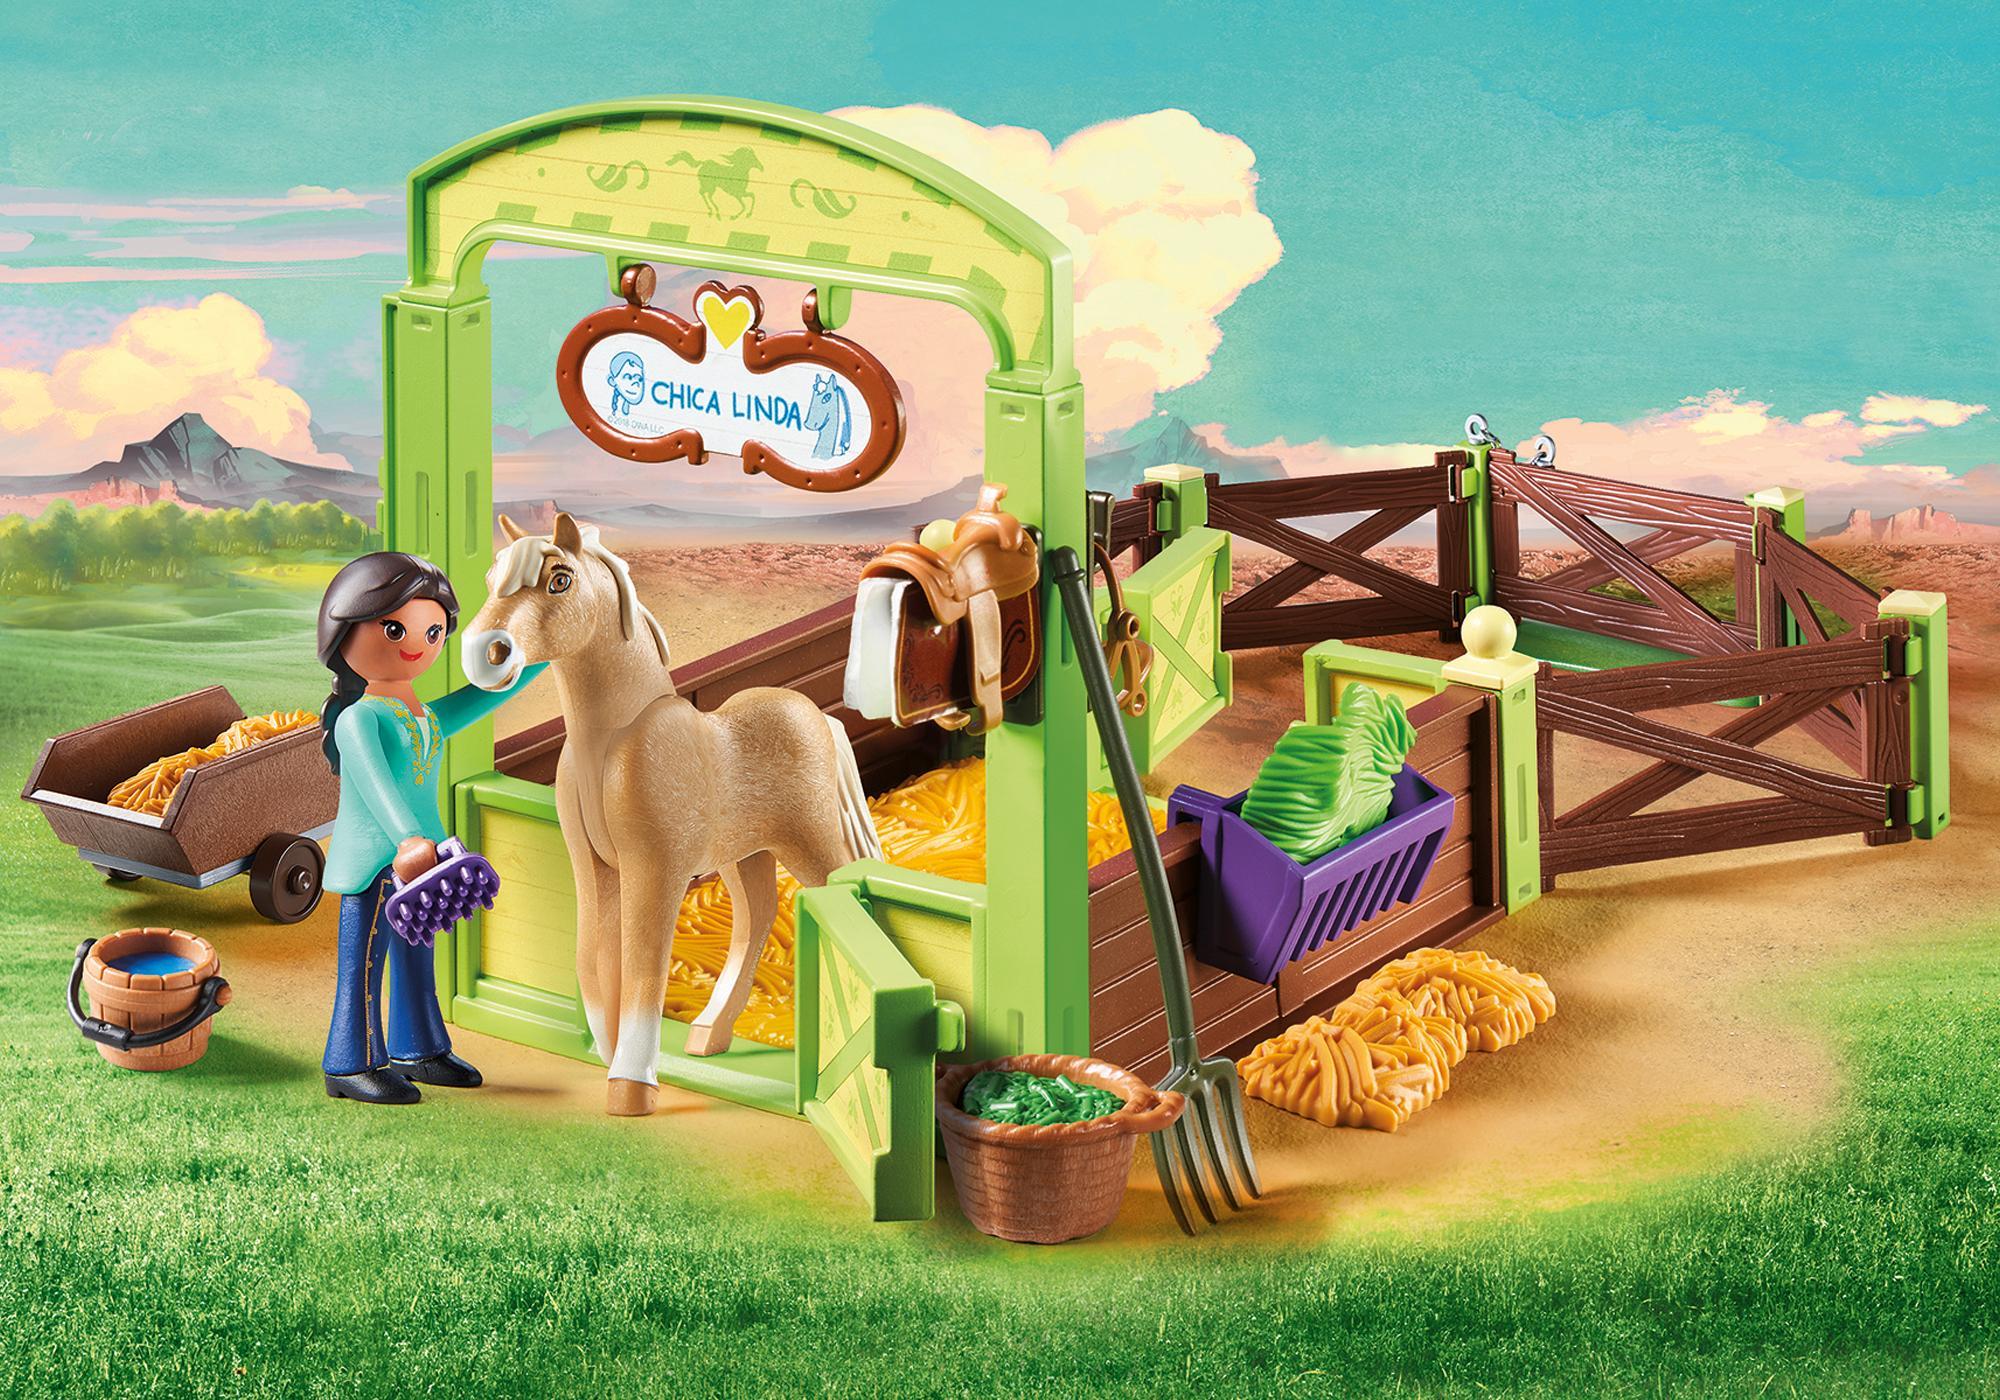 9479_product_detail/Η Πρου με το άλογο Τσίκα Λίντα